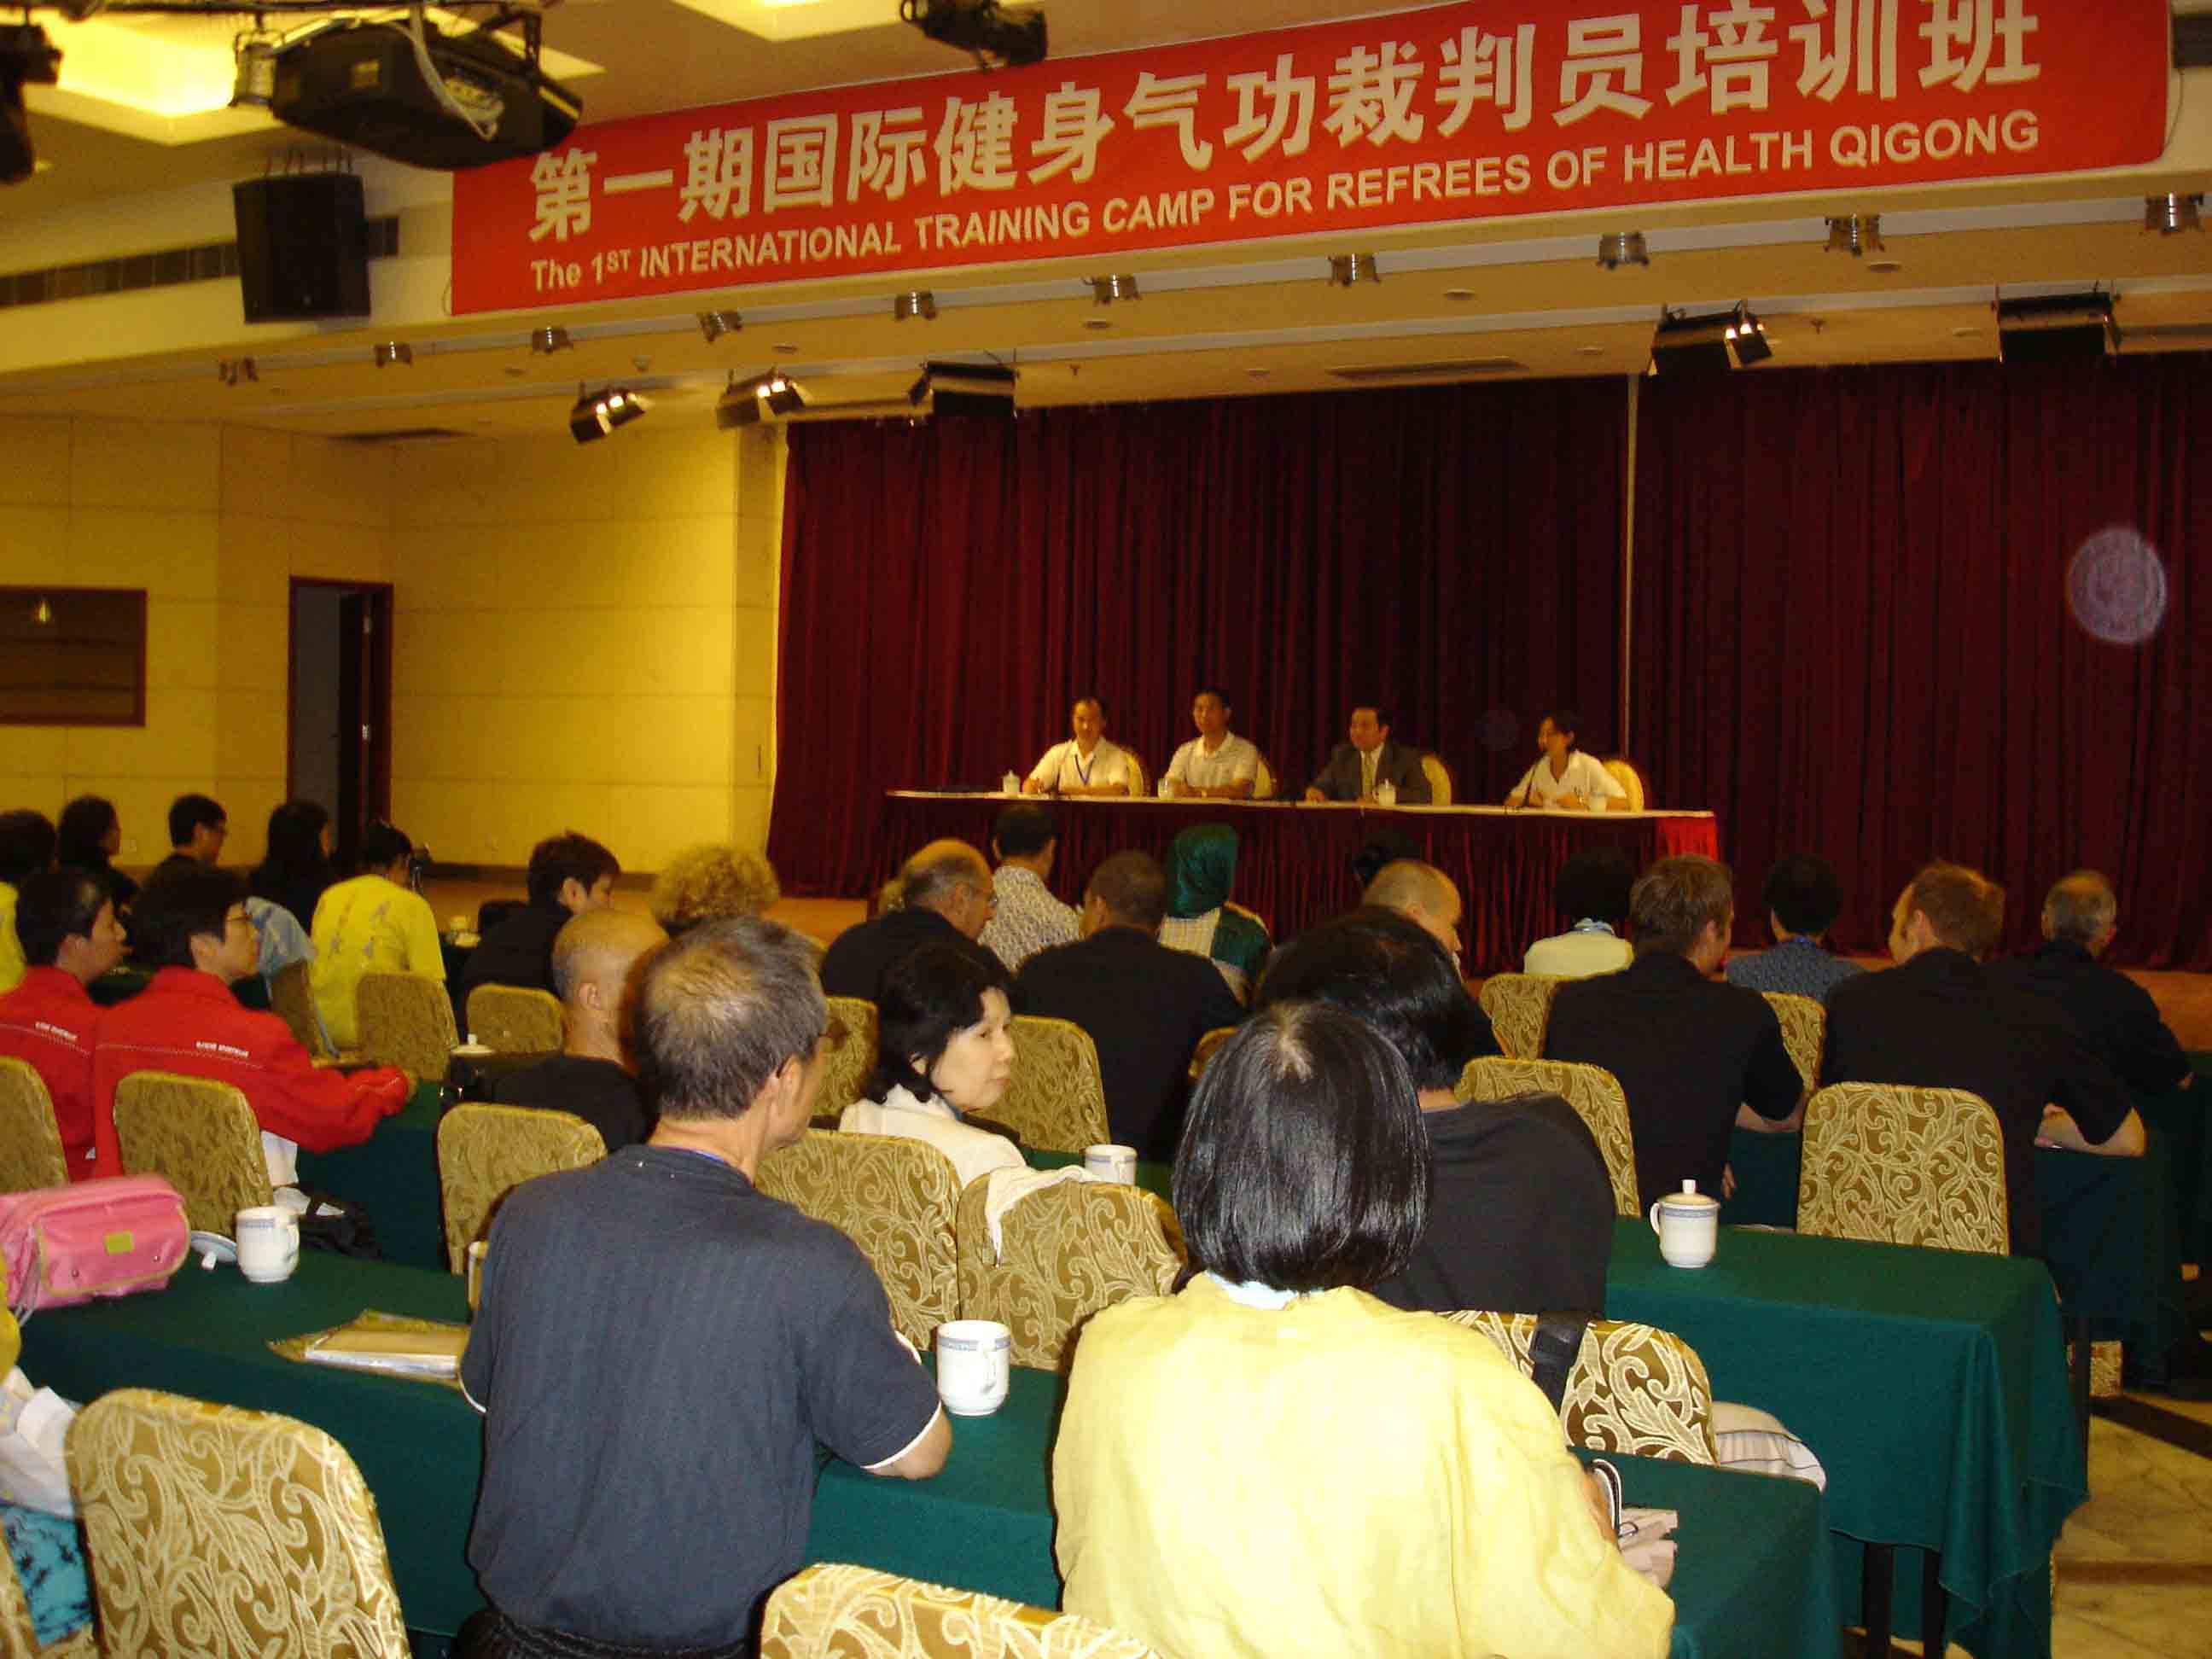 Curso de Arbitraje Internacional de Qigong